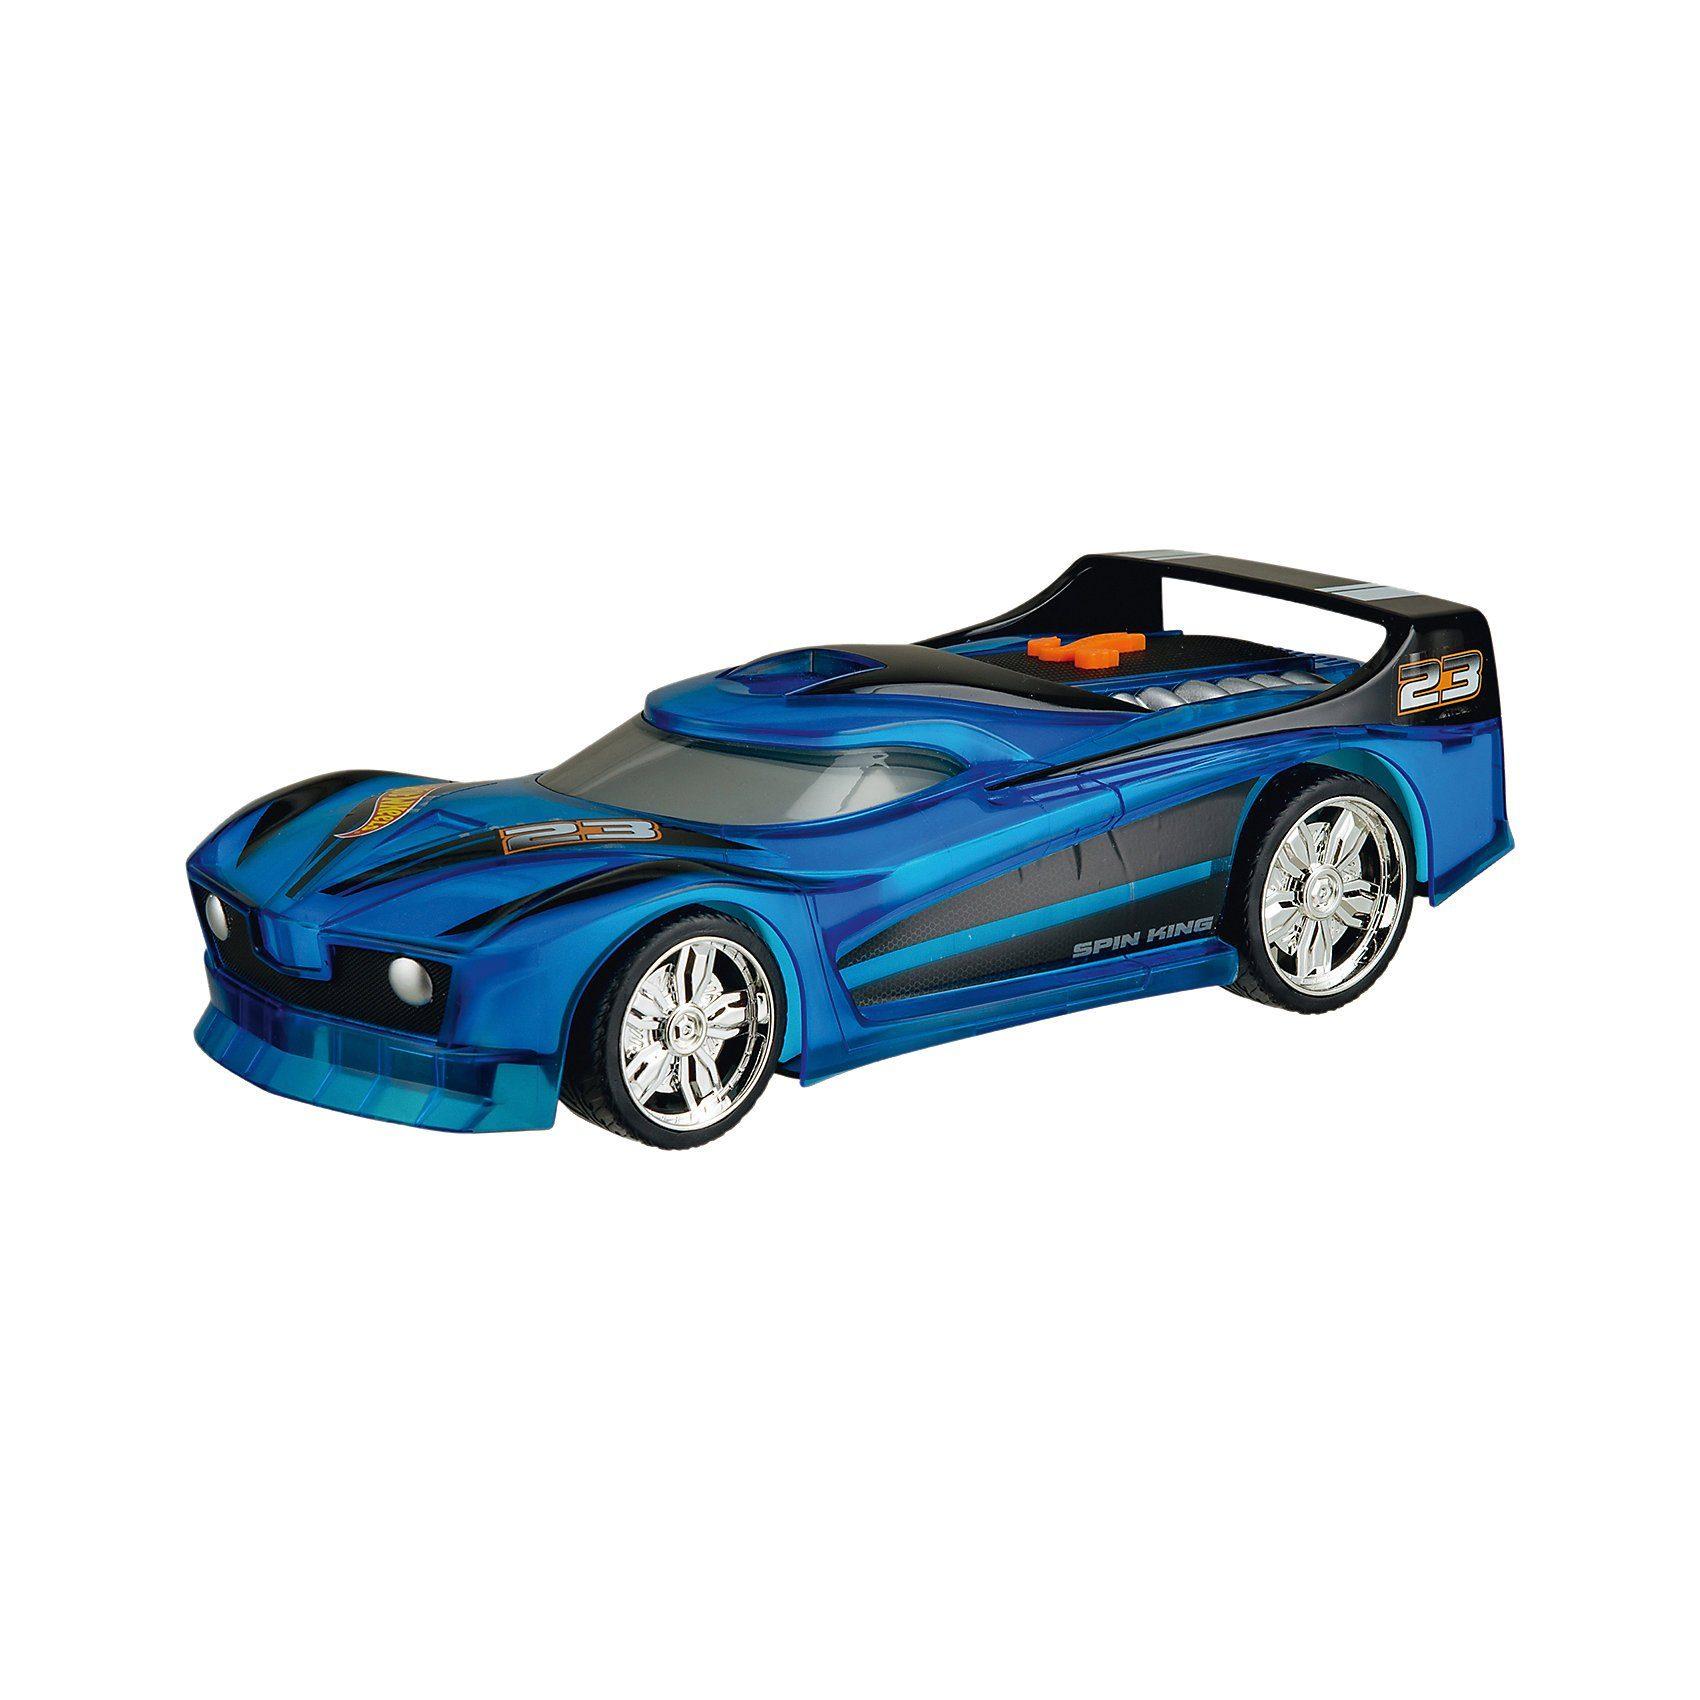 Nikko RC Fahrzeug Hot Wheels Hyper Racer, Spin King